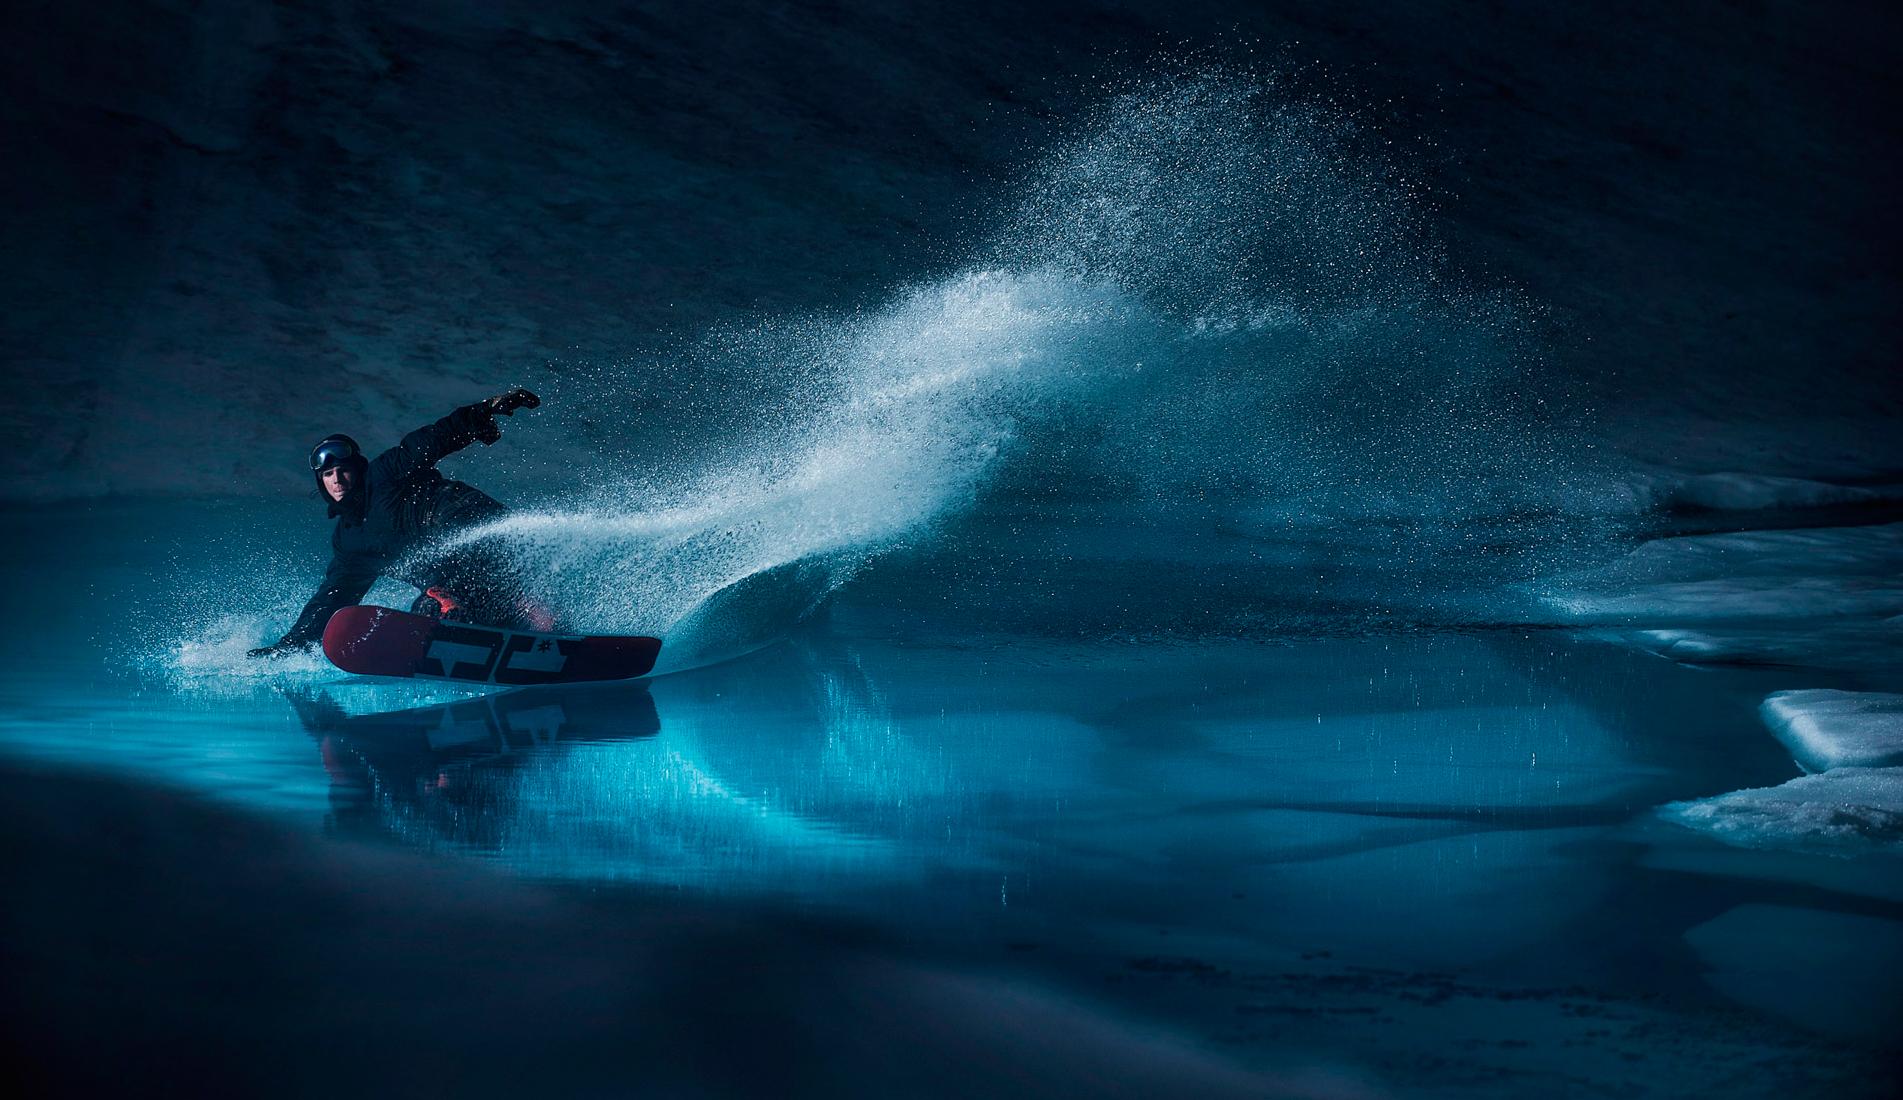 fotos-adrenalina-watersports-13